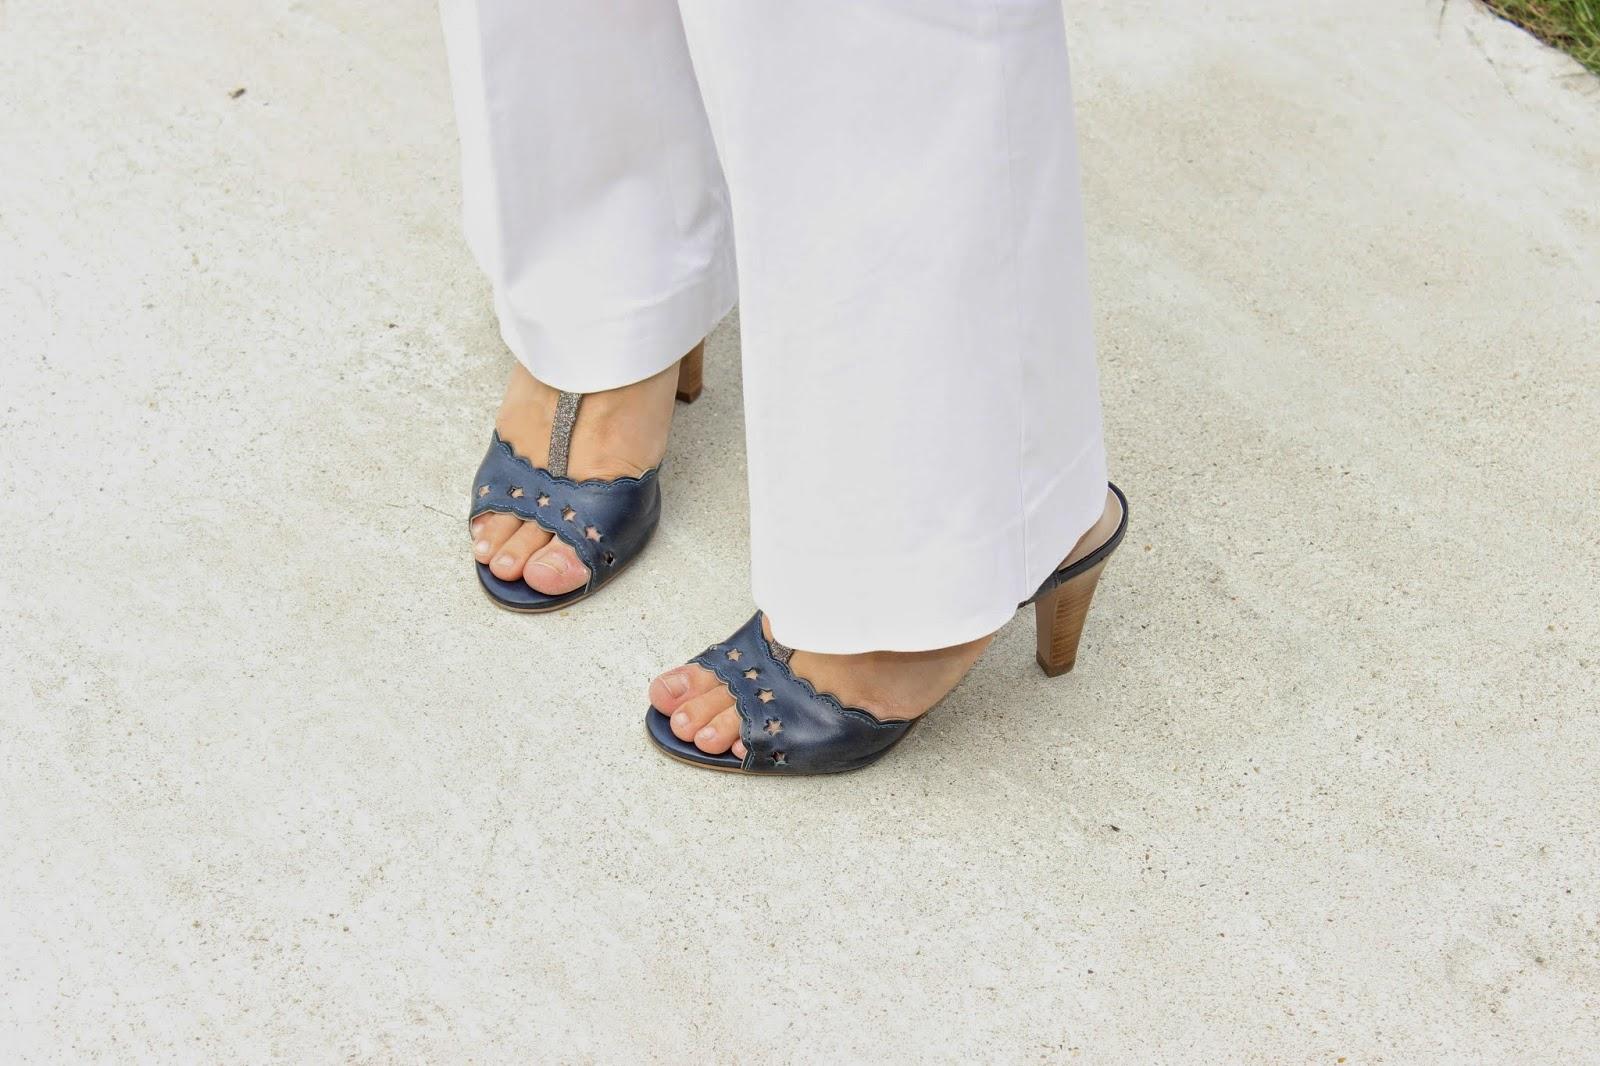 Chaussures étoiles Kookai, veste blanche mango, top see u soon